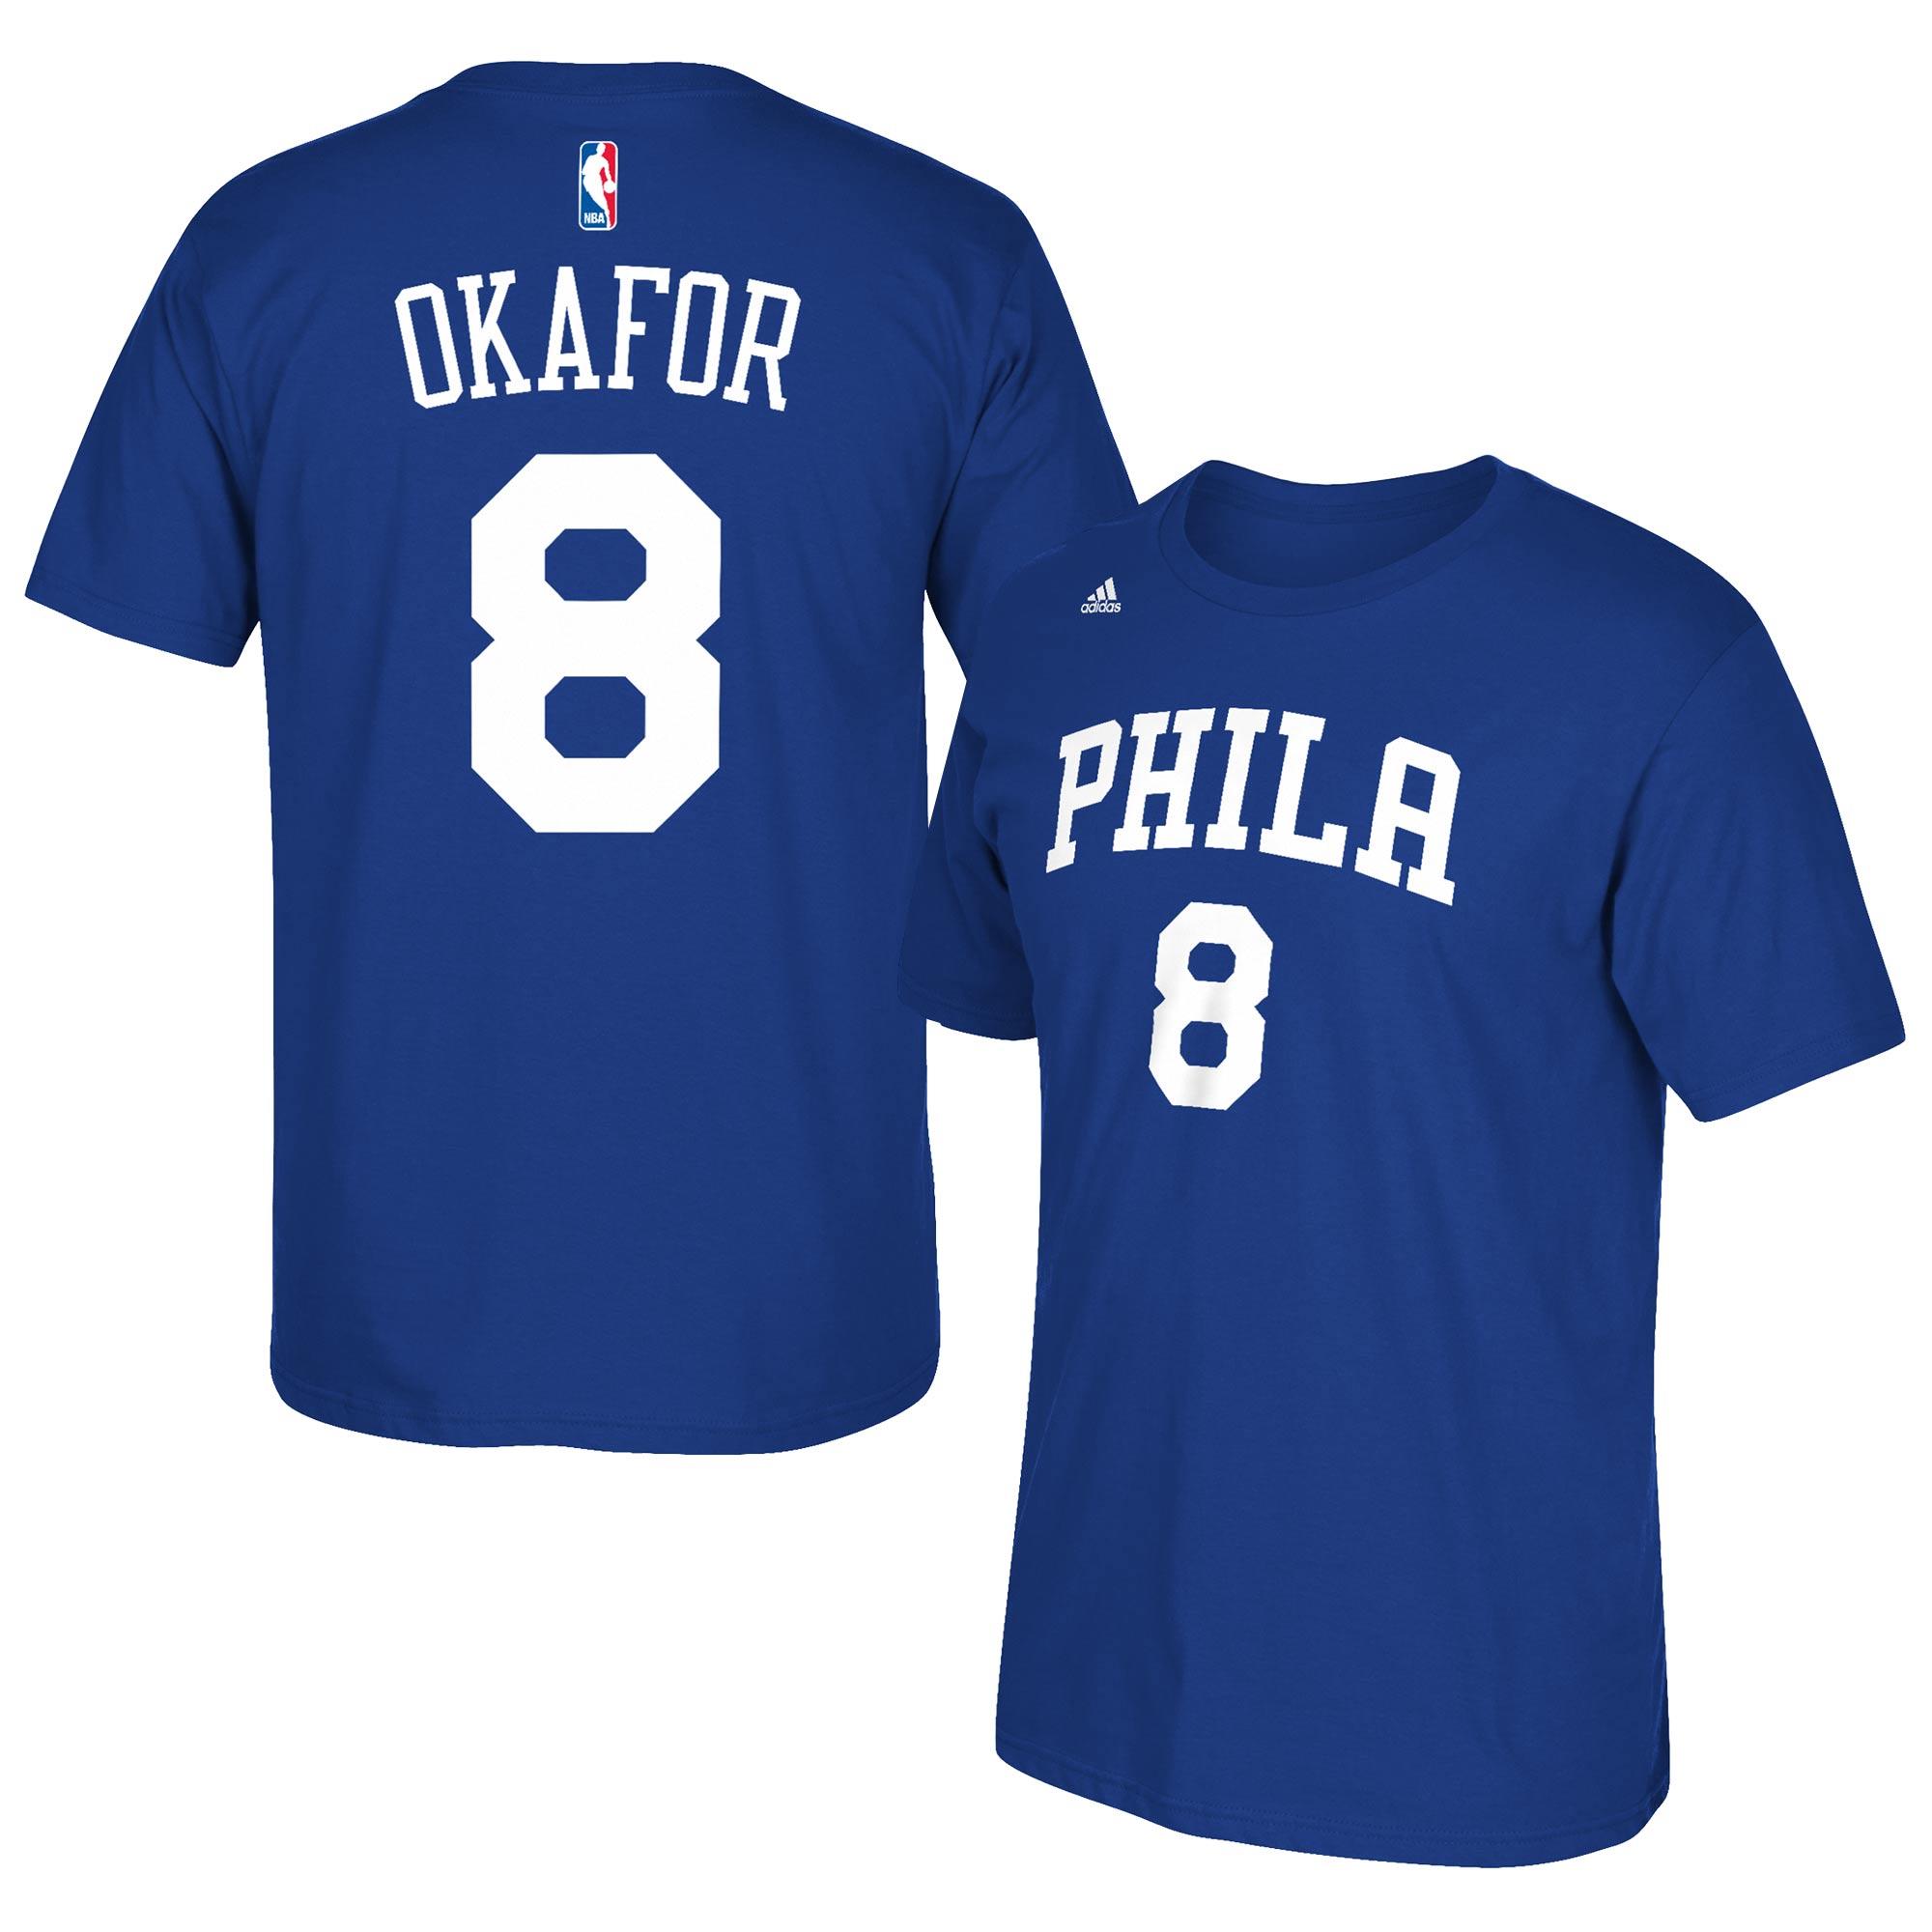 Jahlil Okafor Philadelphia 76ers adidas Net Number T-Shirt - Royal